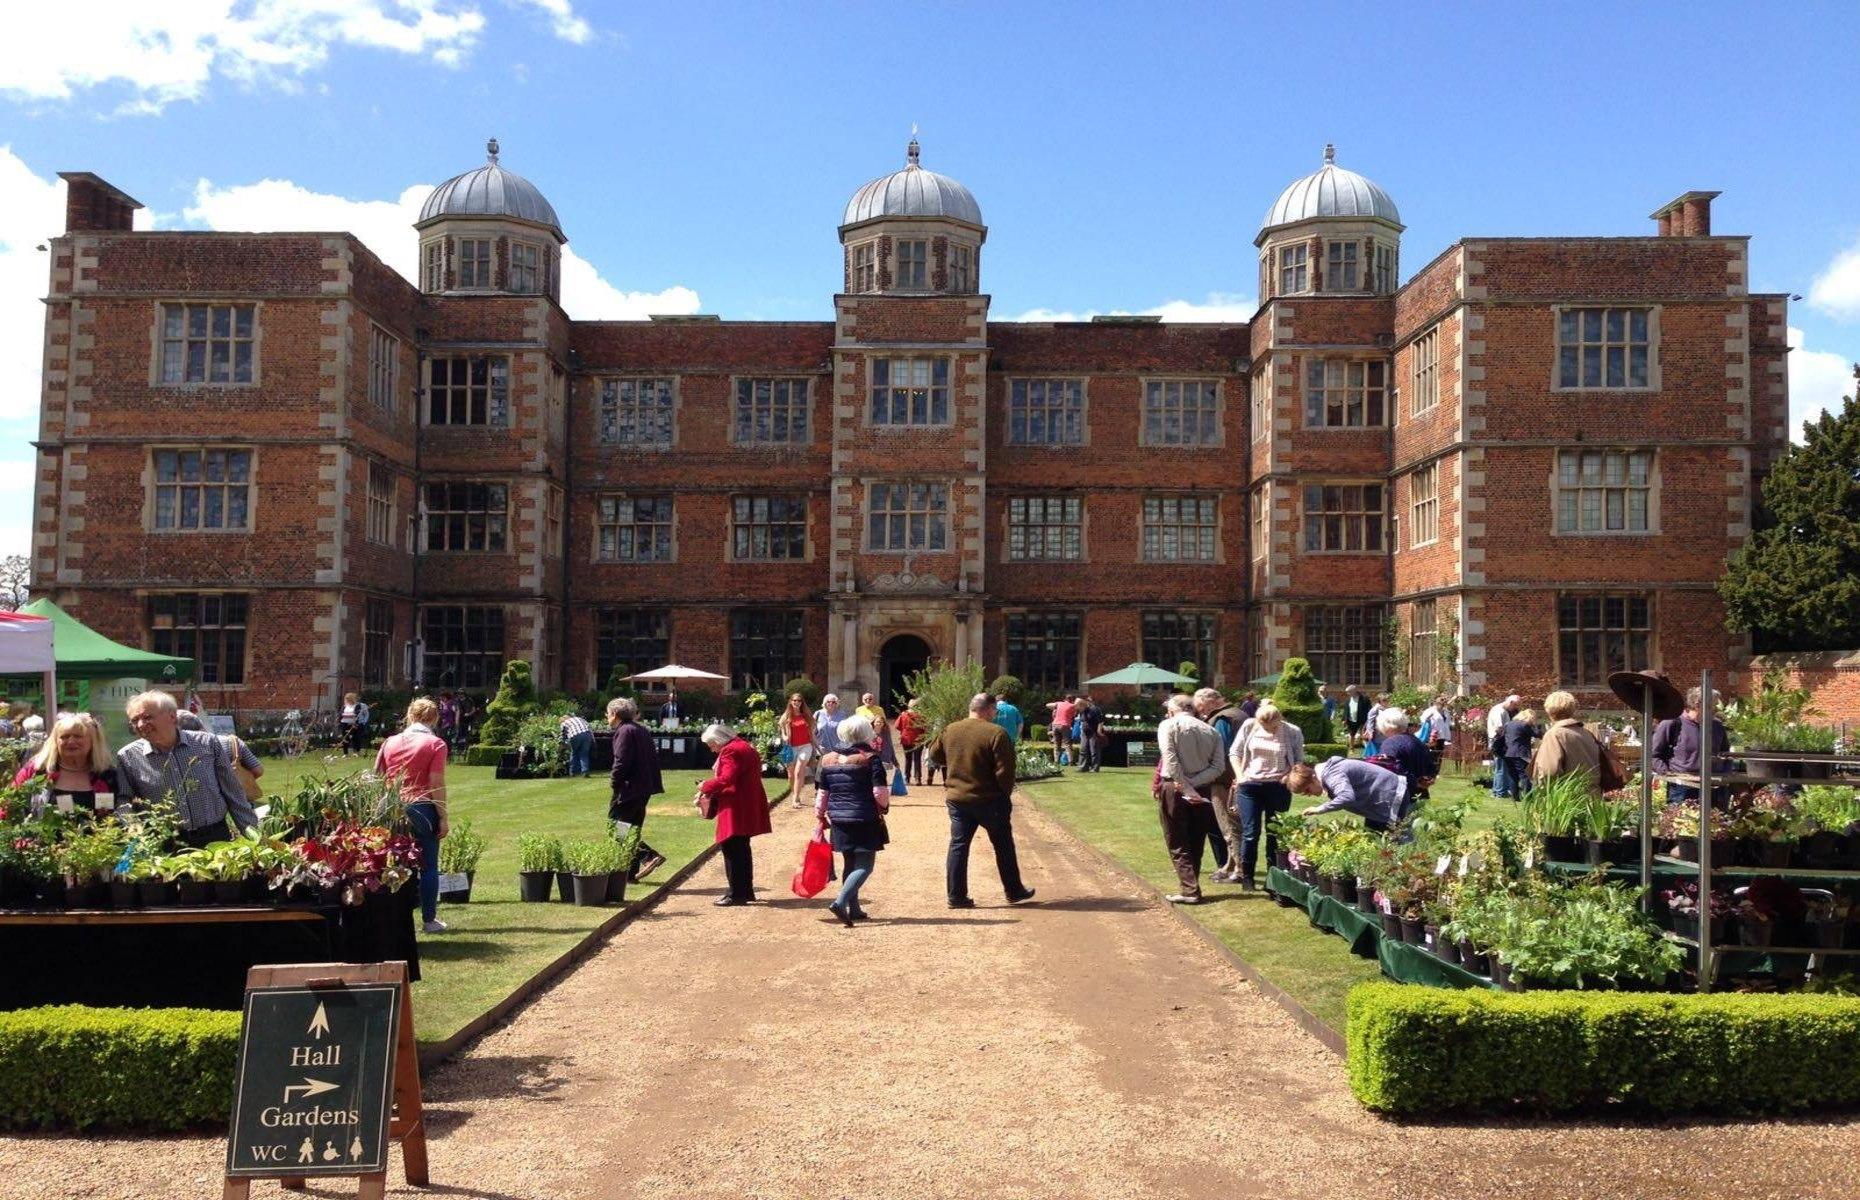 Doddington Hall and Gardens (Image: Doddington Hall and Gardens/Facebook)